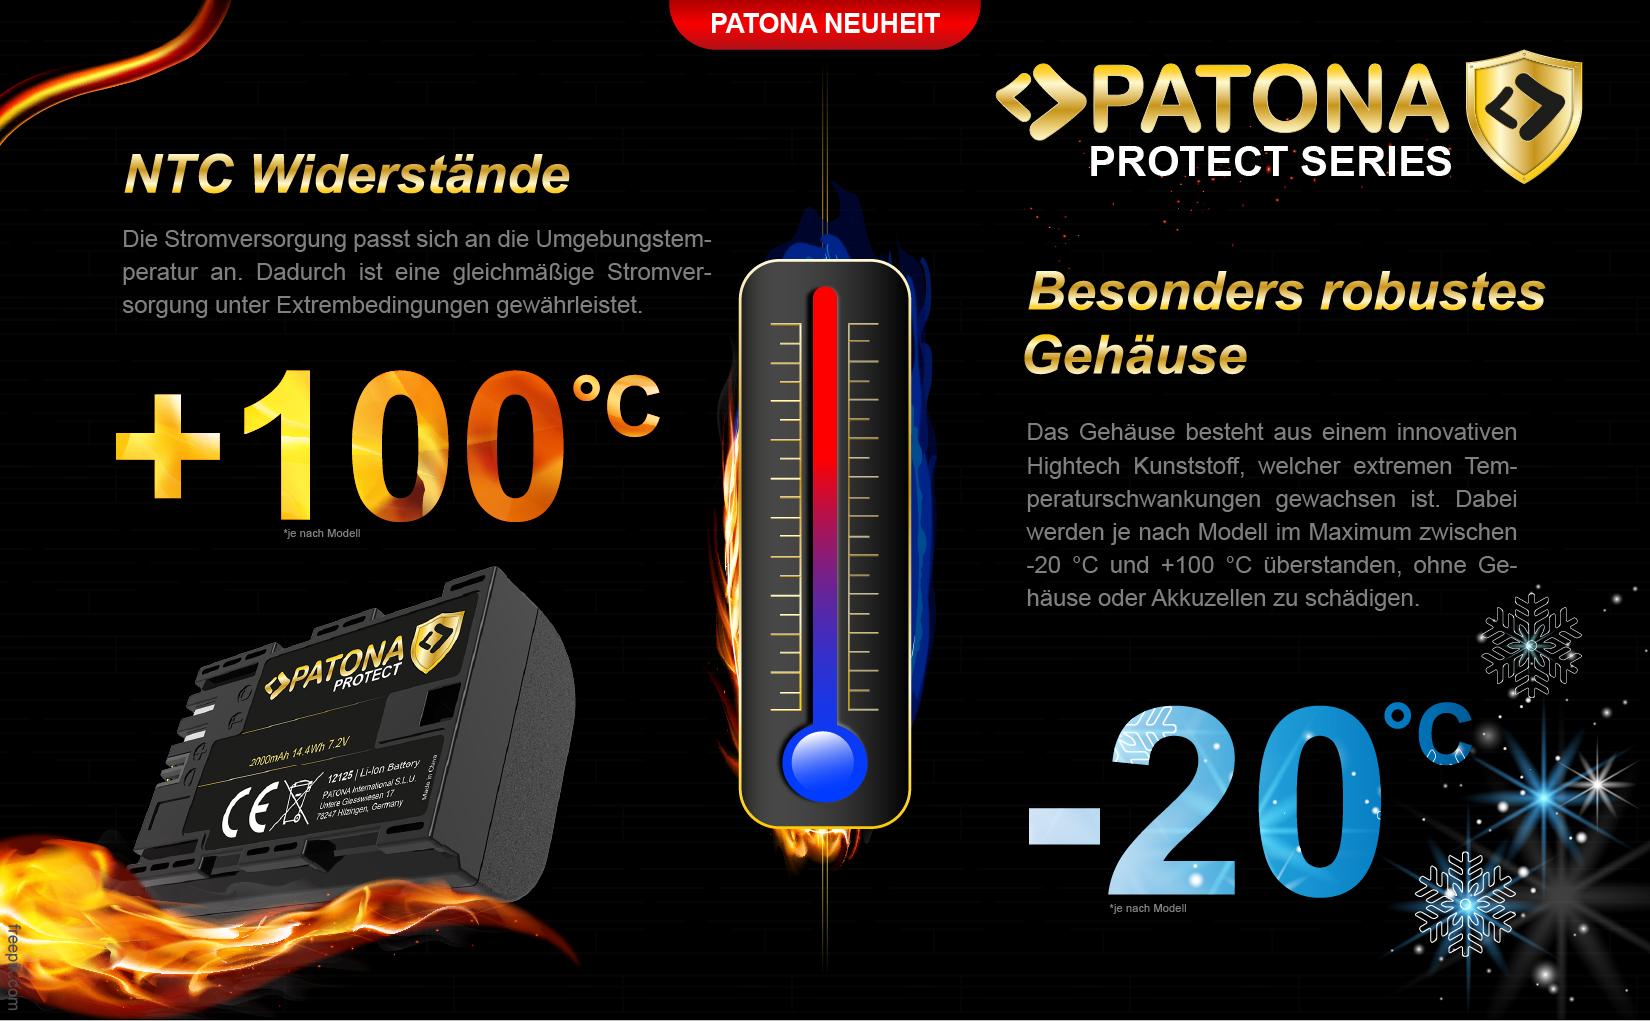 PATONA PROTECT Akku f. Panasonic DMW-BLG10 DMW-BLE9 DMC-GF3 DMC-LX85 DMC-LX100